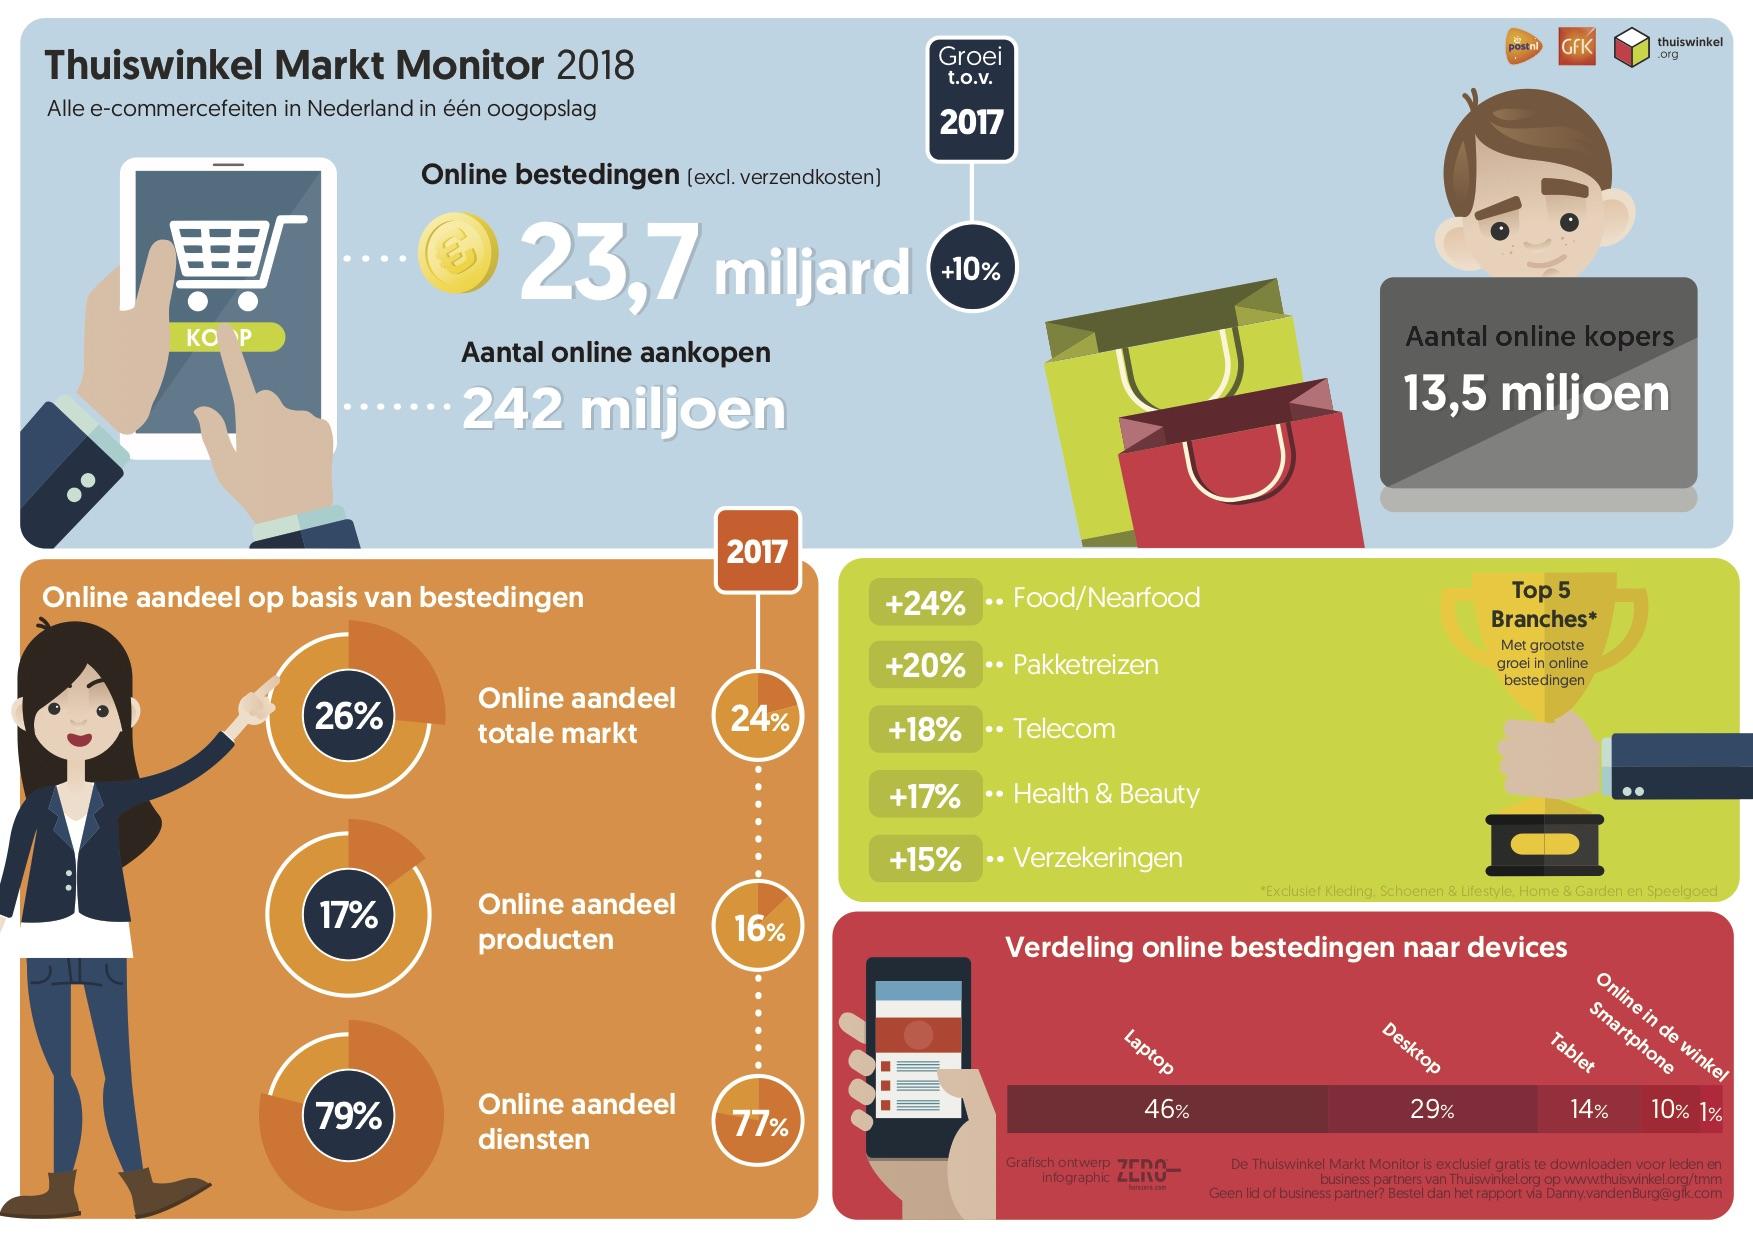 Thuiswinkel Markt Monitor 2018